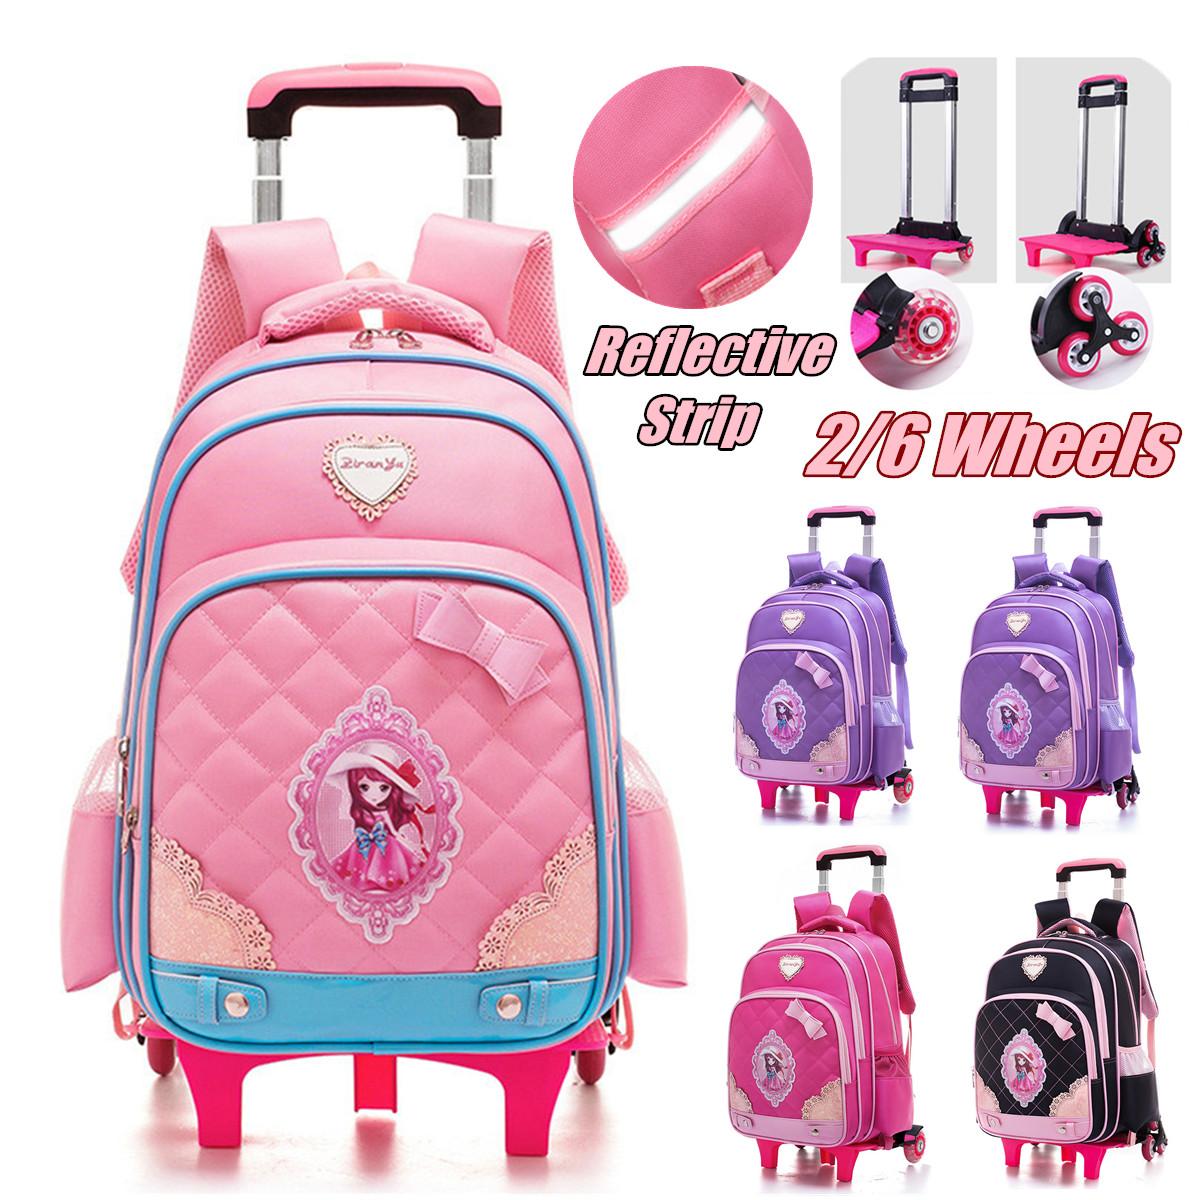 Boys Kids 2//6 Wheels Trolley School Bag Backpack Travel Luggage Rucksack BookBag